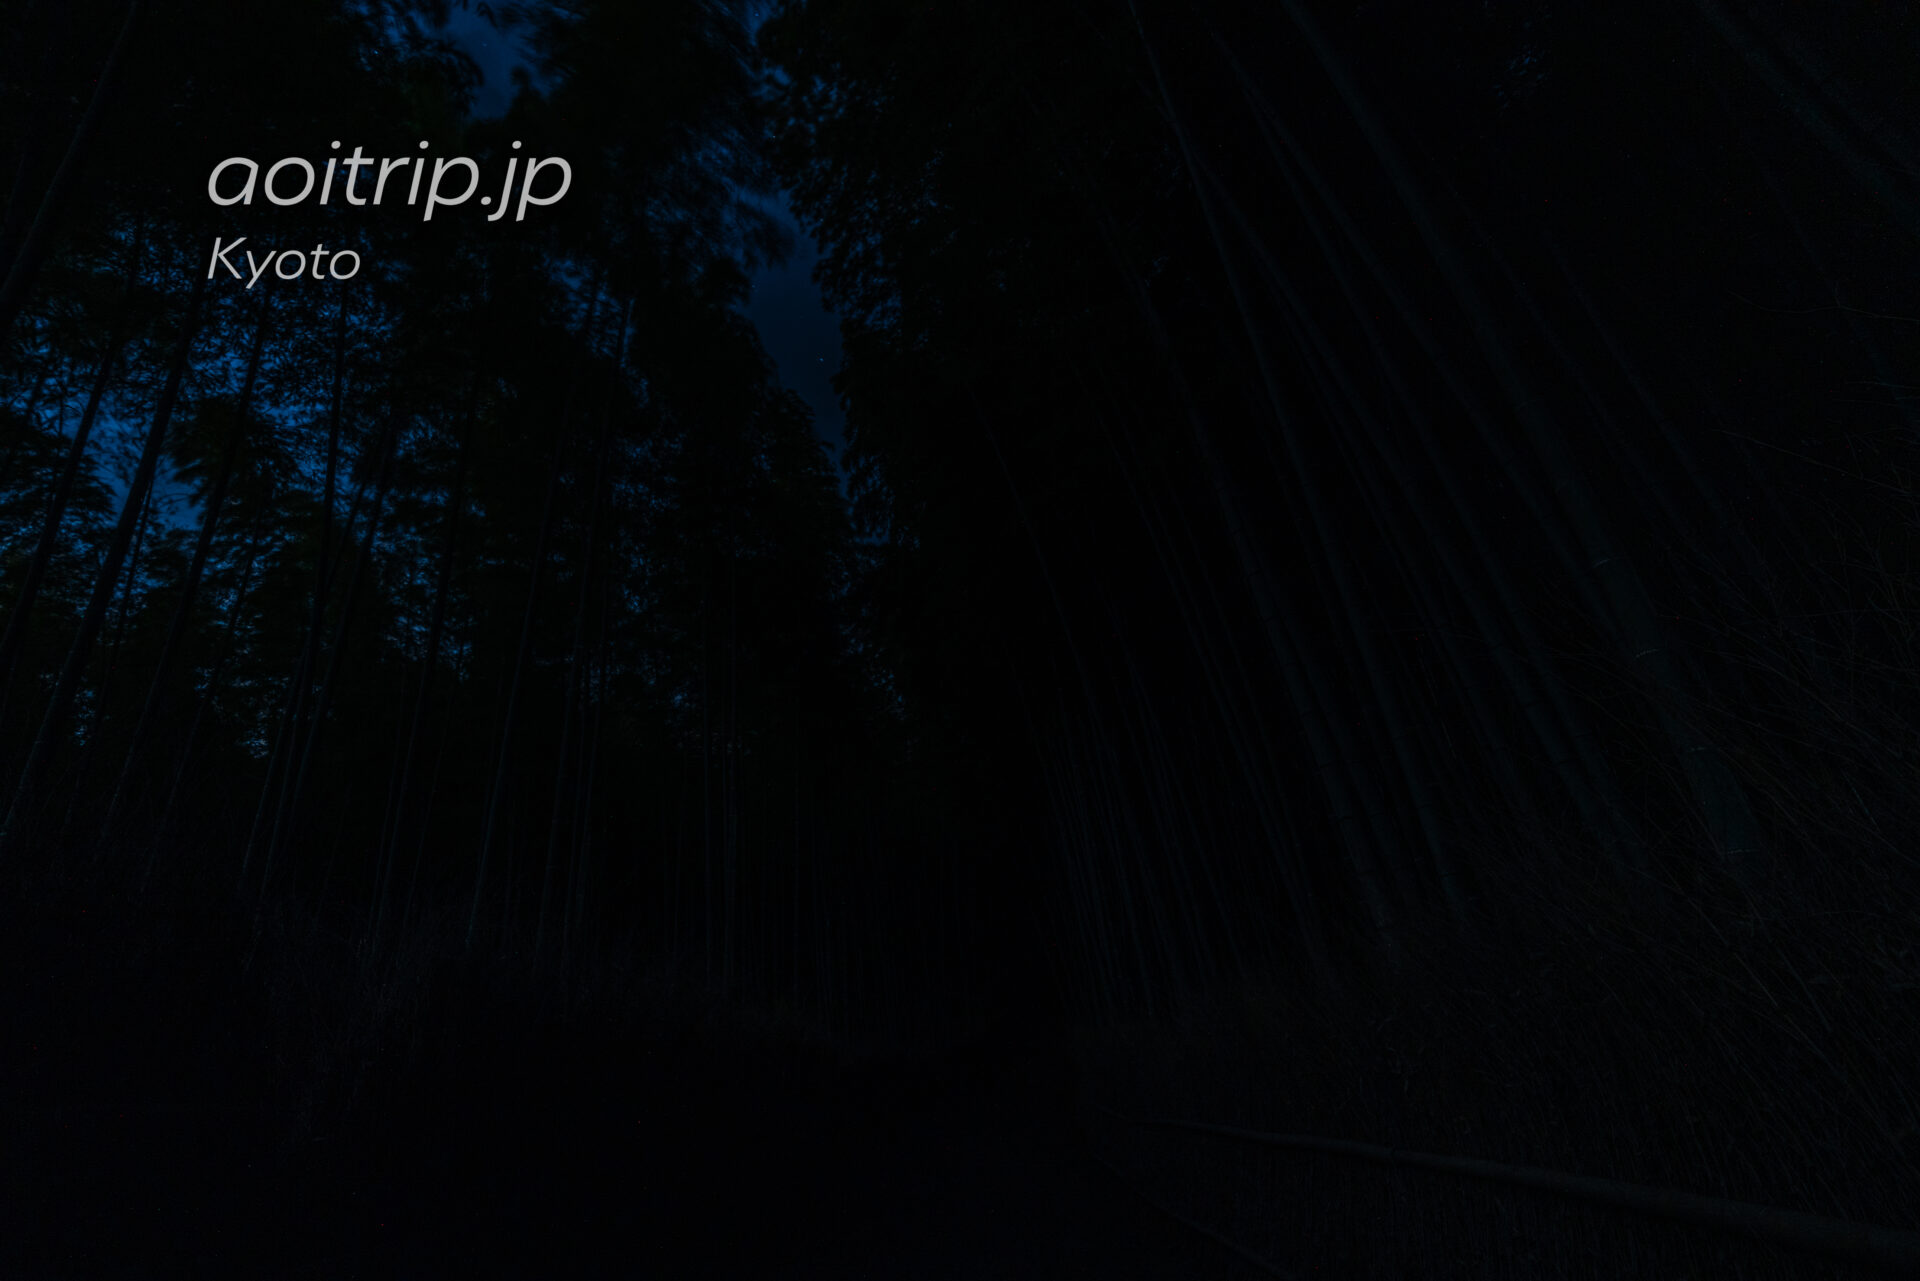 京都嵐山 竹林の小径 夜